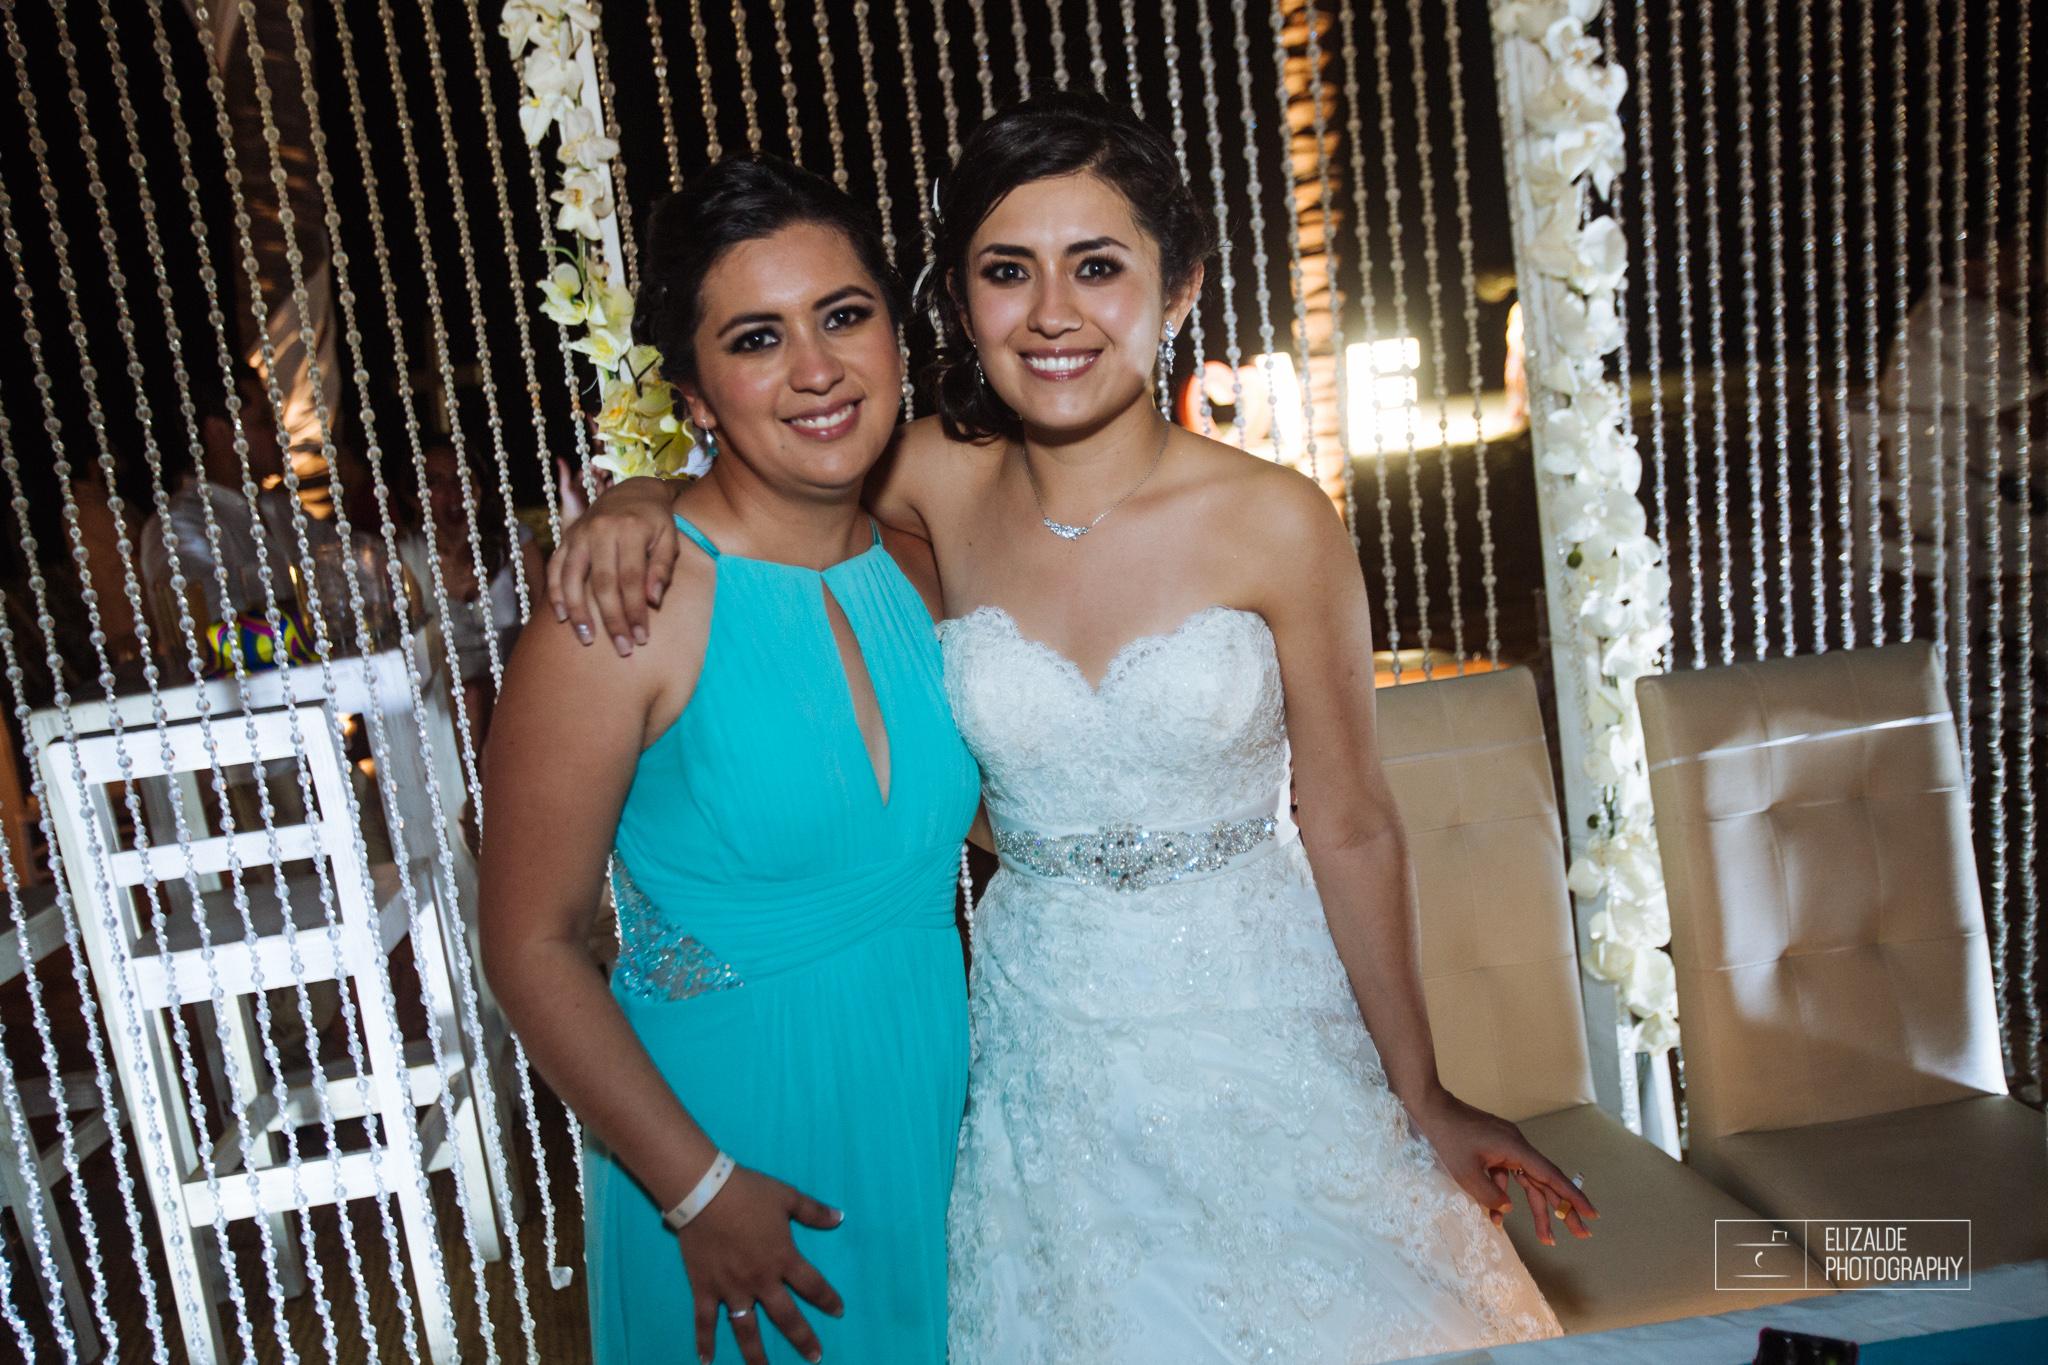 Pay and Ferran_Acapulco_Destination Wedding_Elizalde Photography-153.jpg